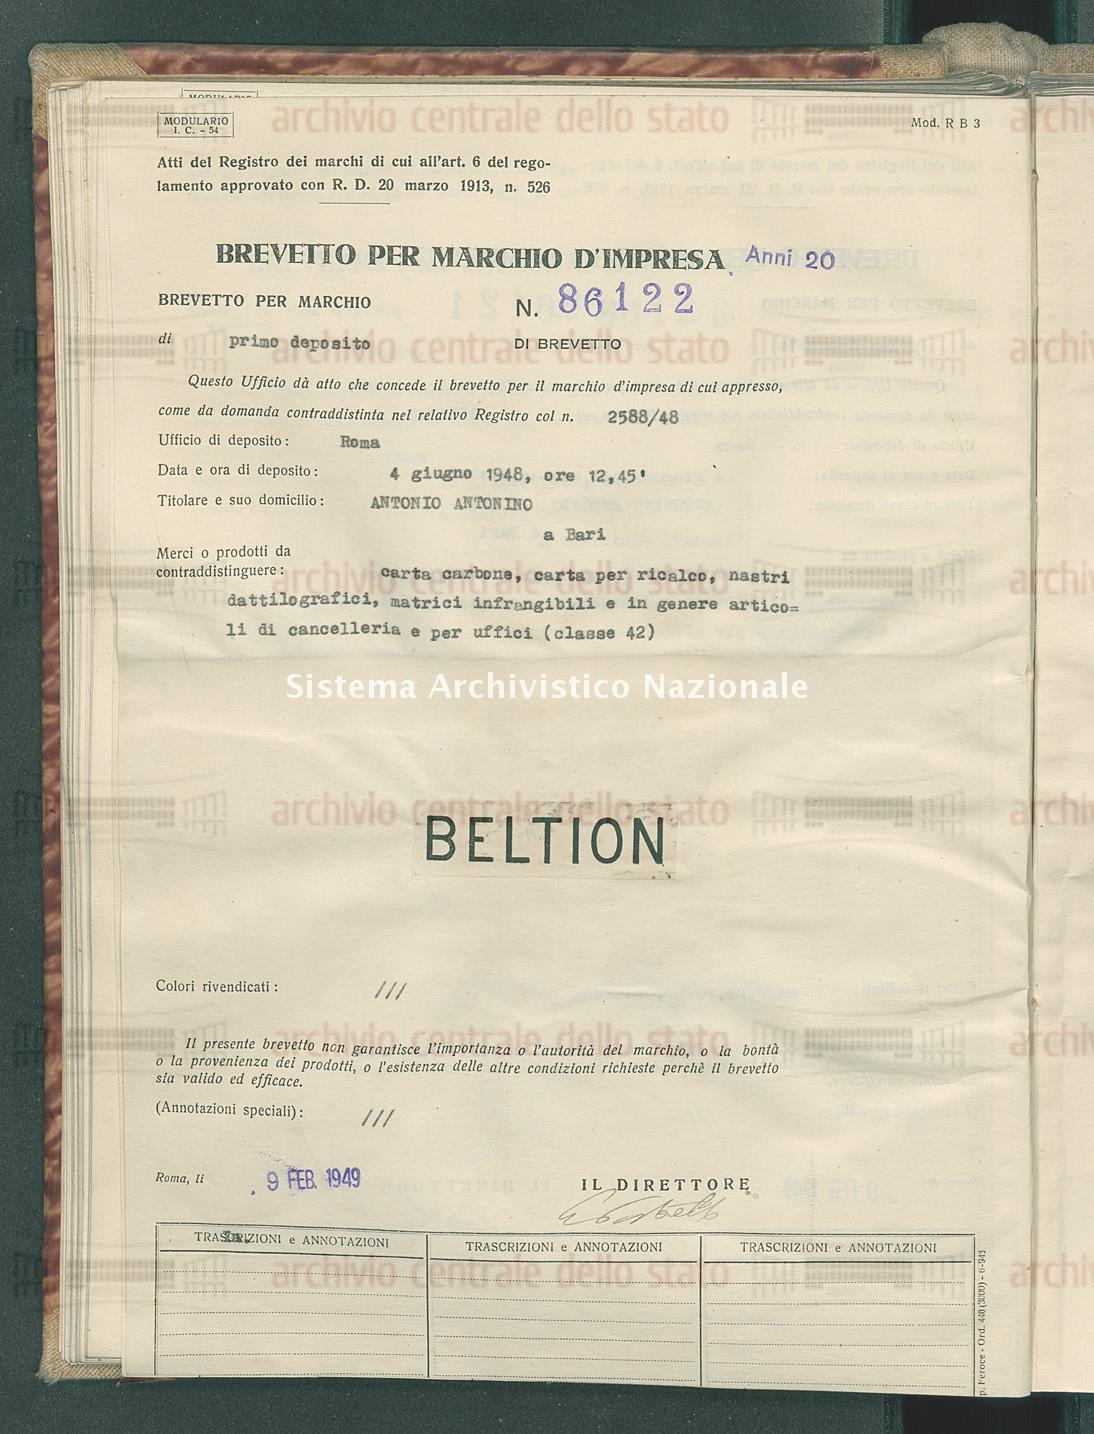 Carta carbone, carta per ricalco, nastri dattilografici, matrici infra Antonino Antonio (09/02/1949)